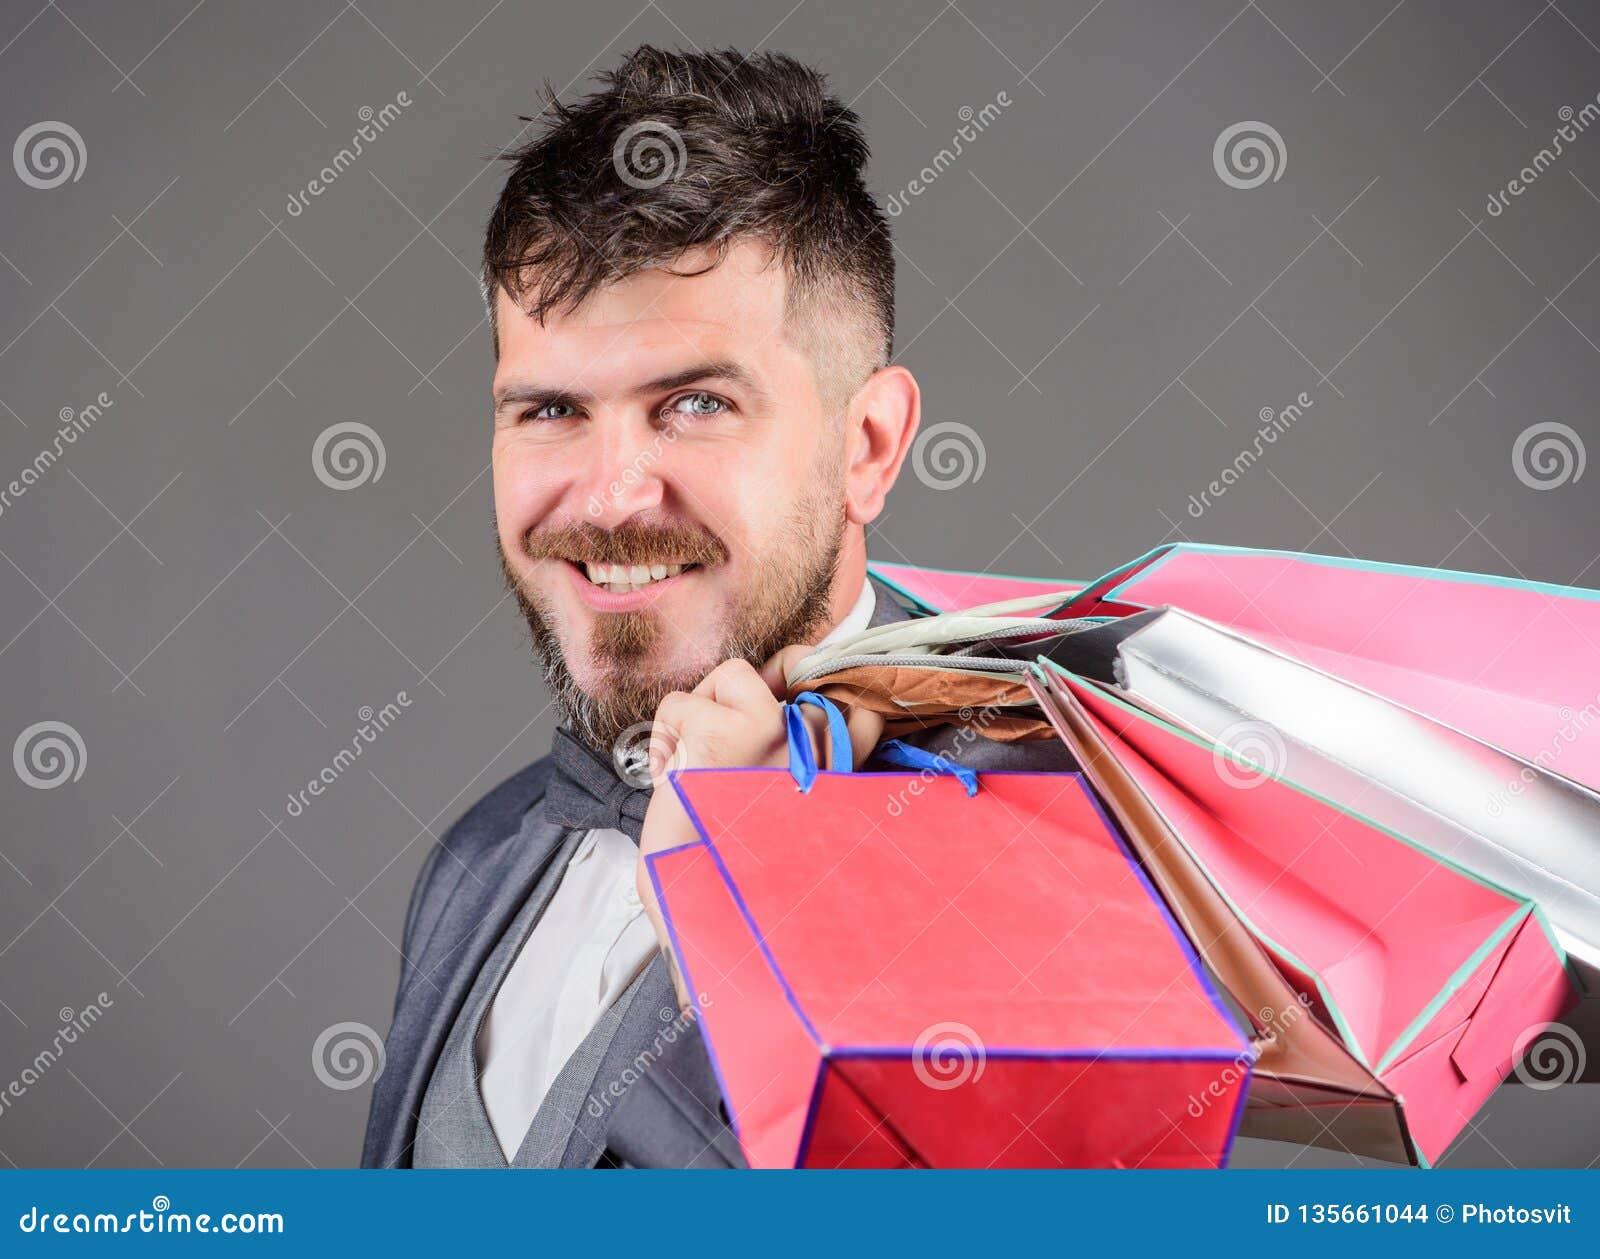 Man bearded elegant businessman carry shopping bags on grey background. Make shopping more joyful. Elite boutique. Enjoy